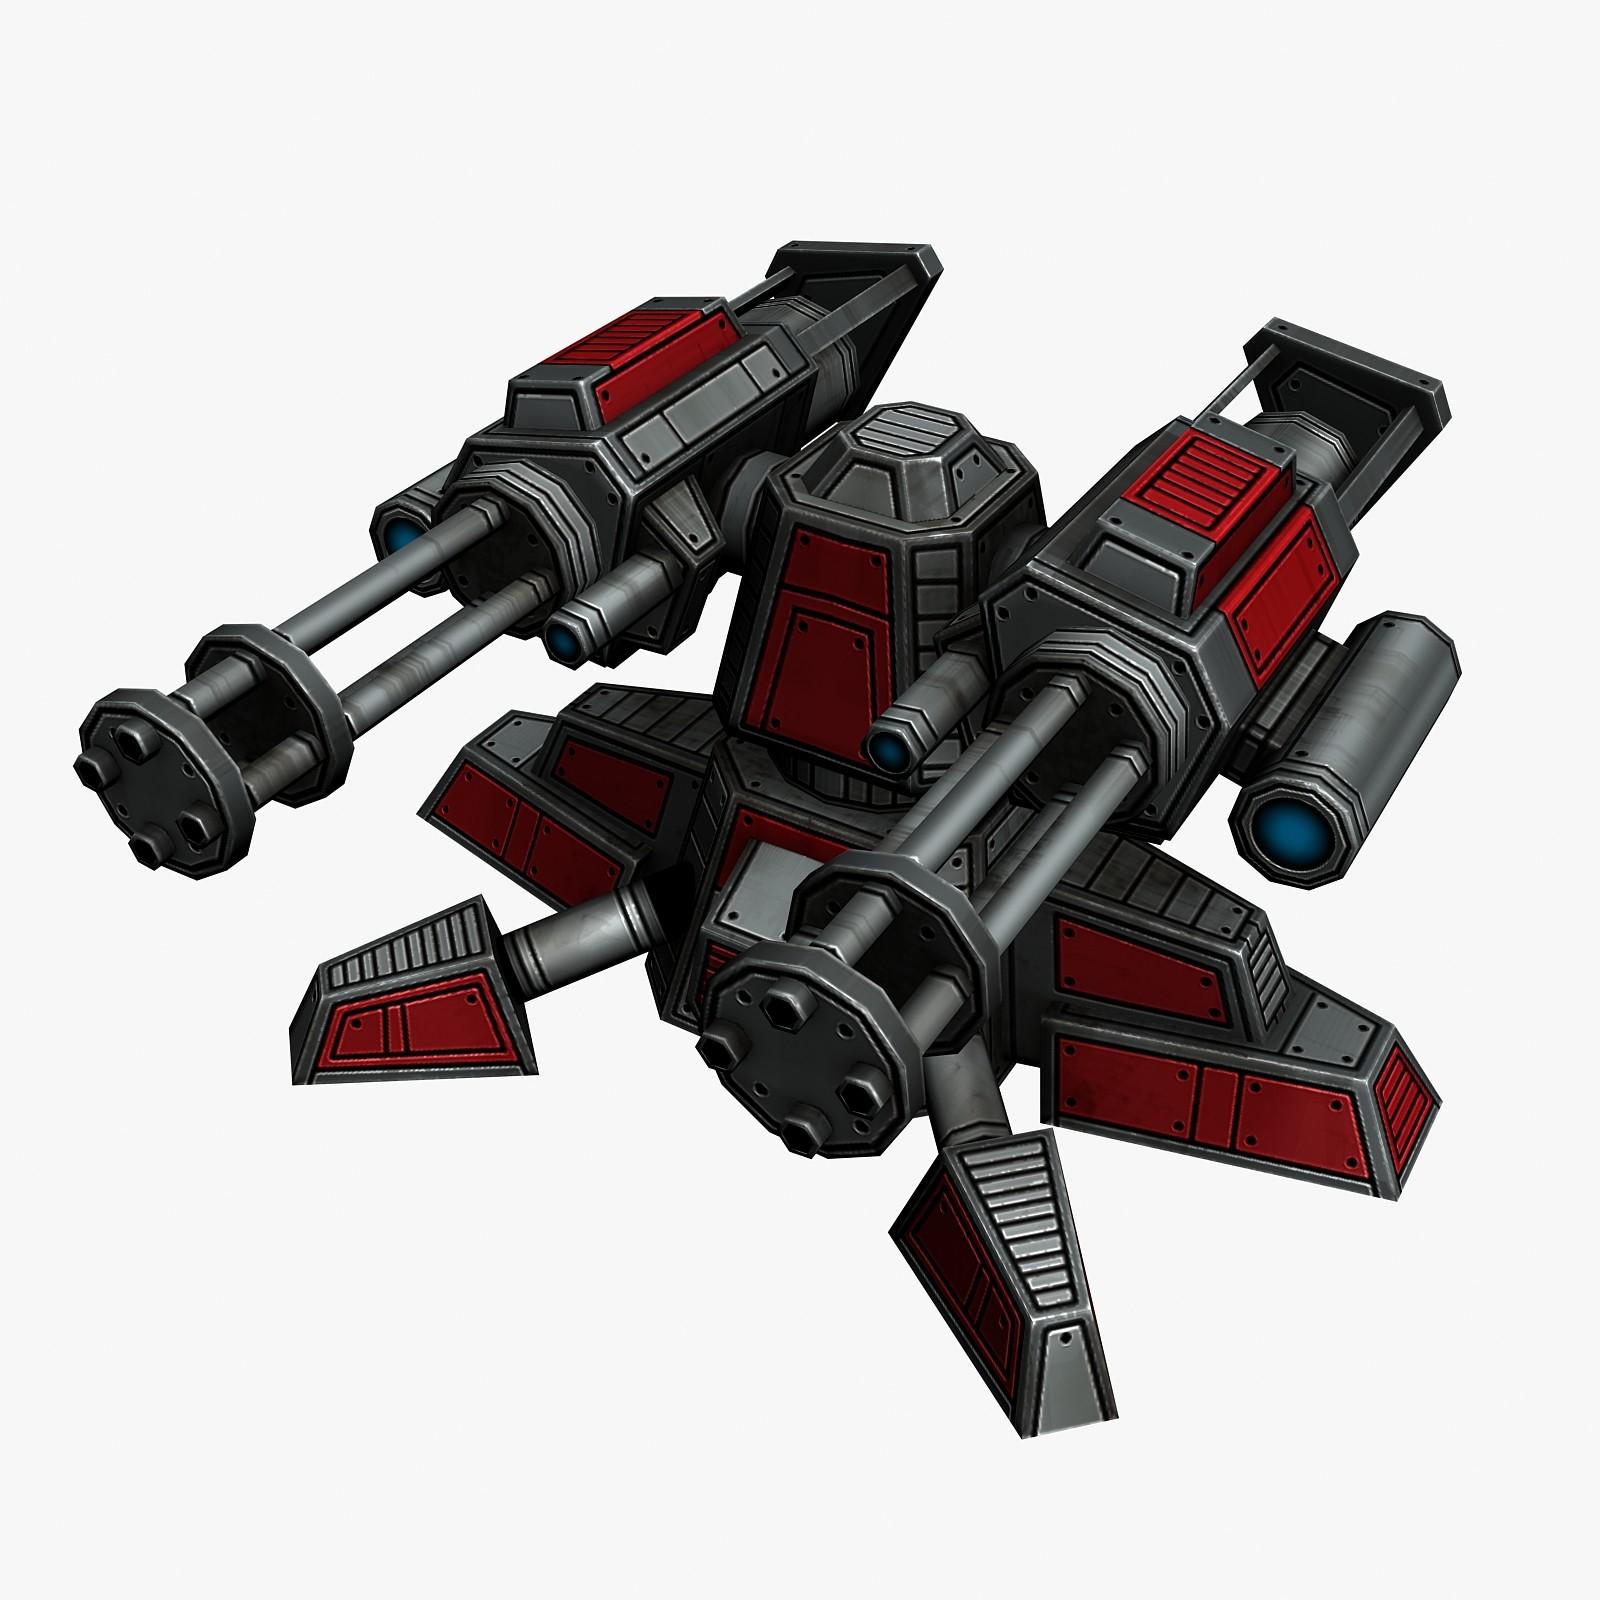 sci_fi_mini_gun_1_preview_1.jpg